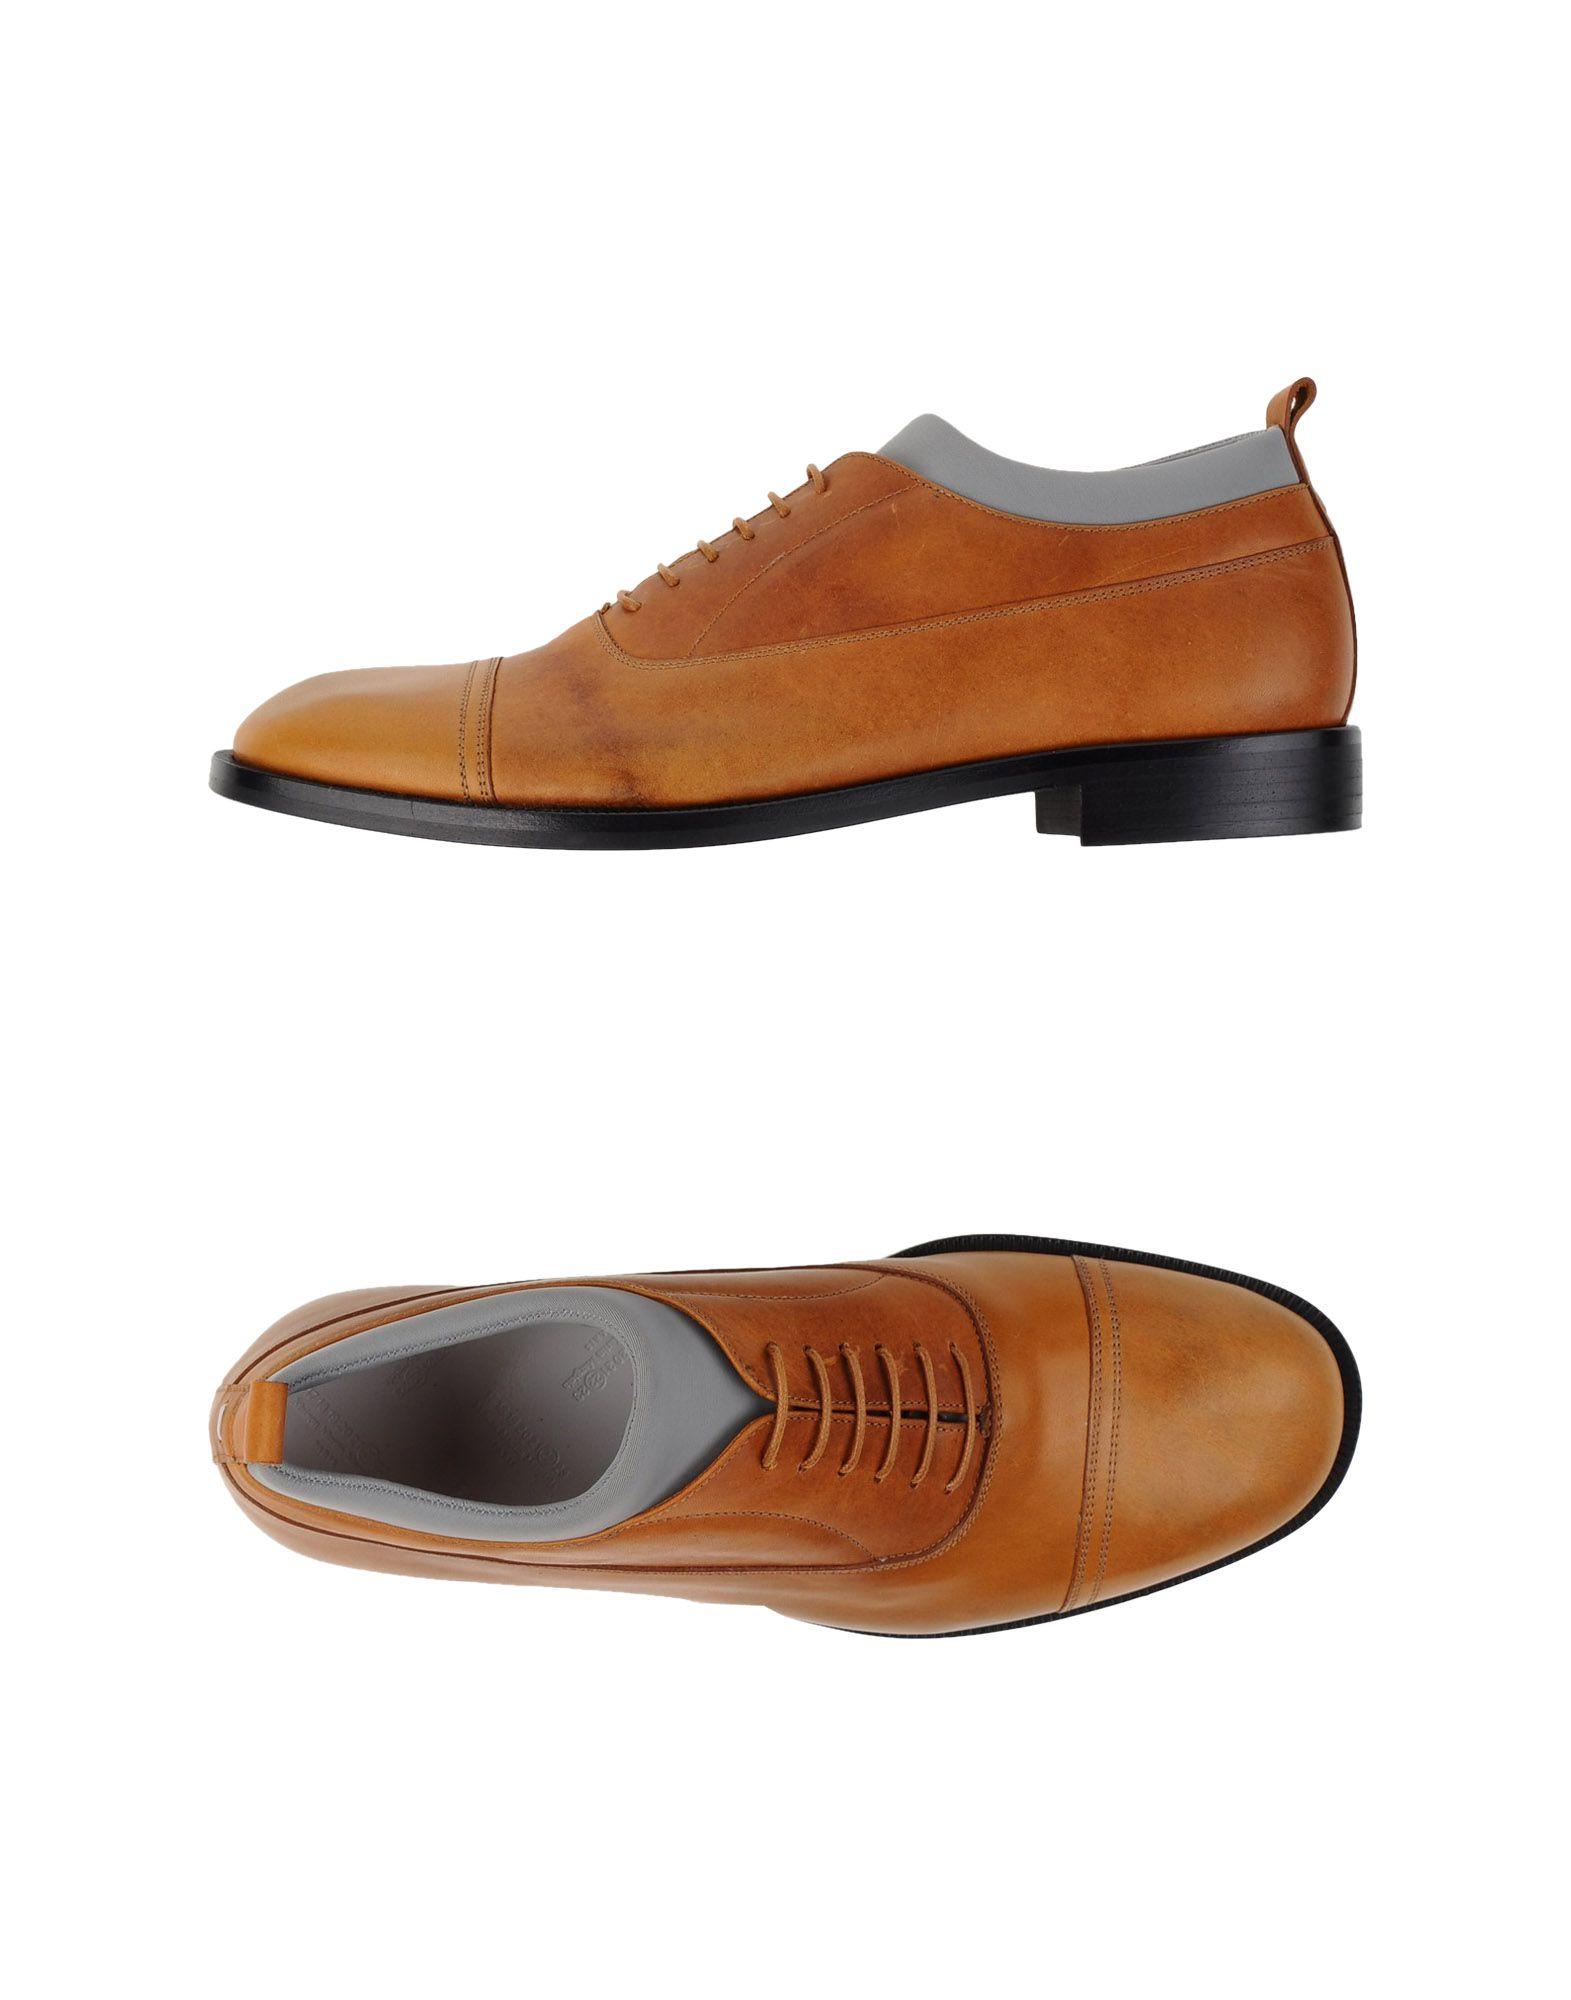 maison margiela lace up shoes in brown lyst. Black Bedroom Furniture Sets. Home Design Ideas